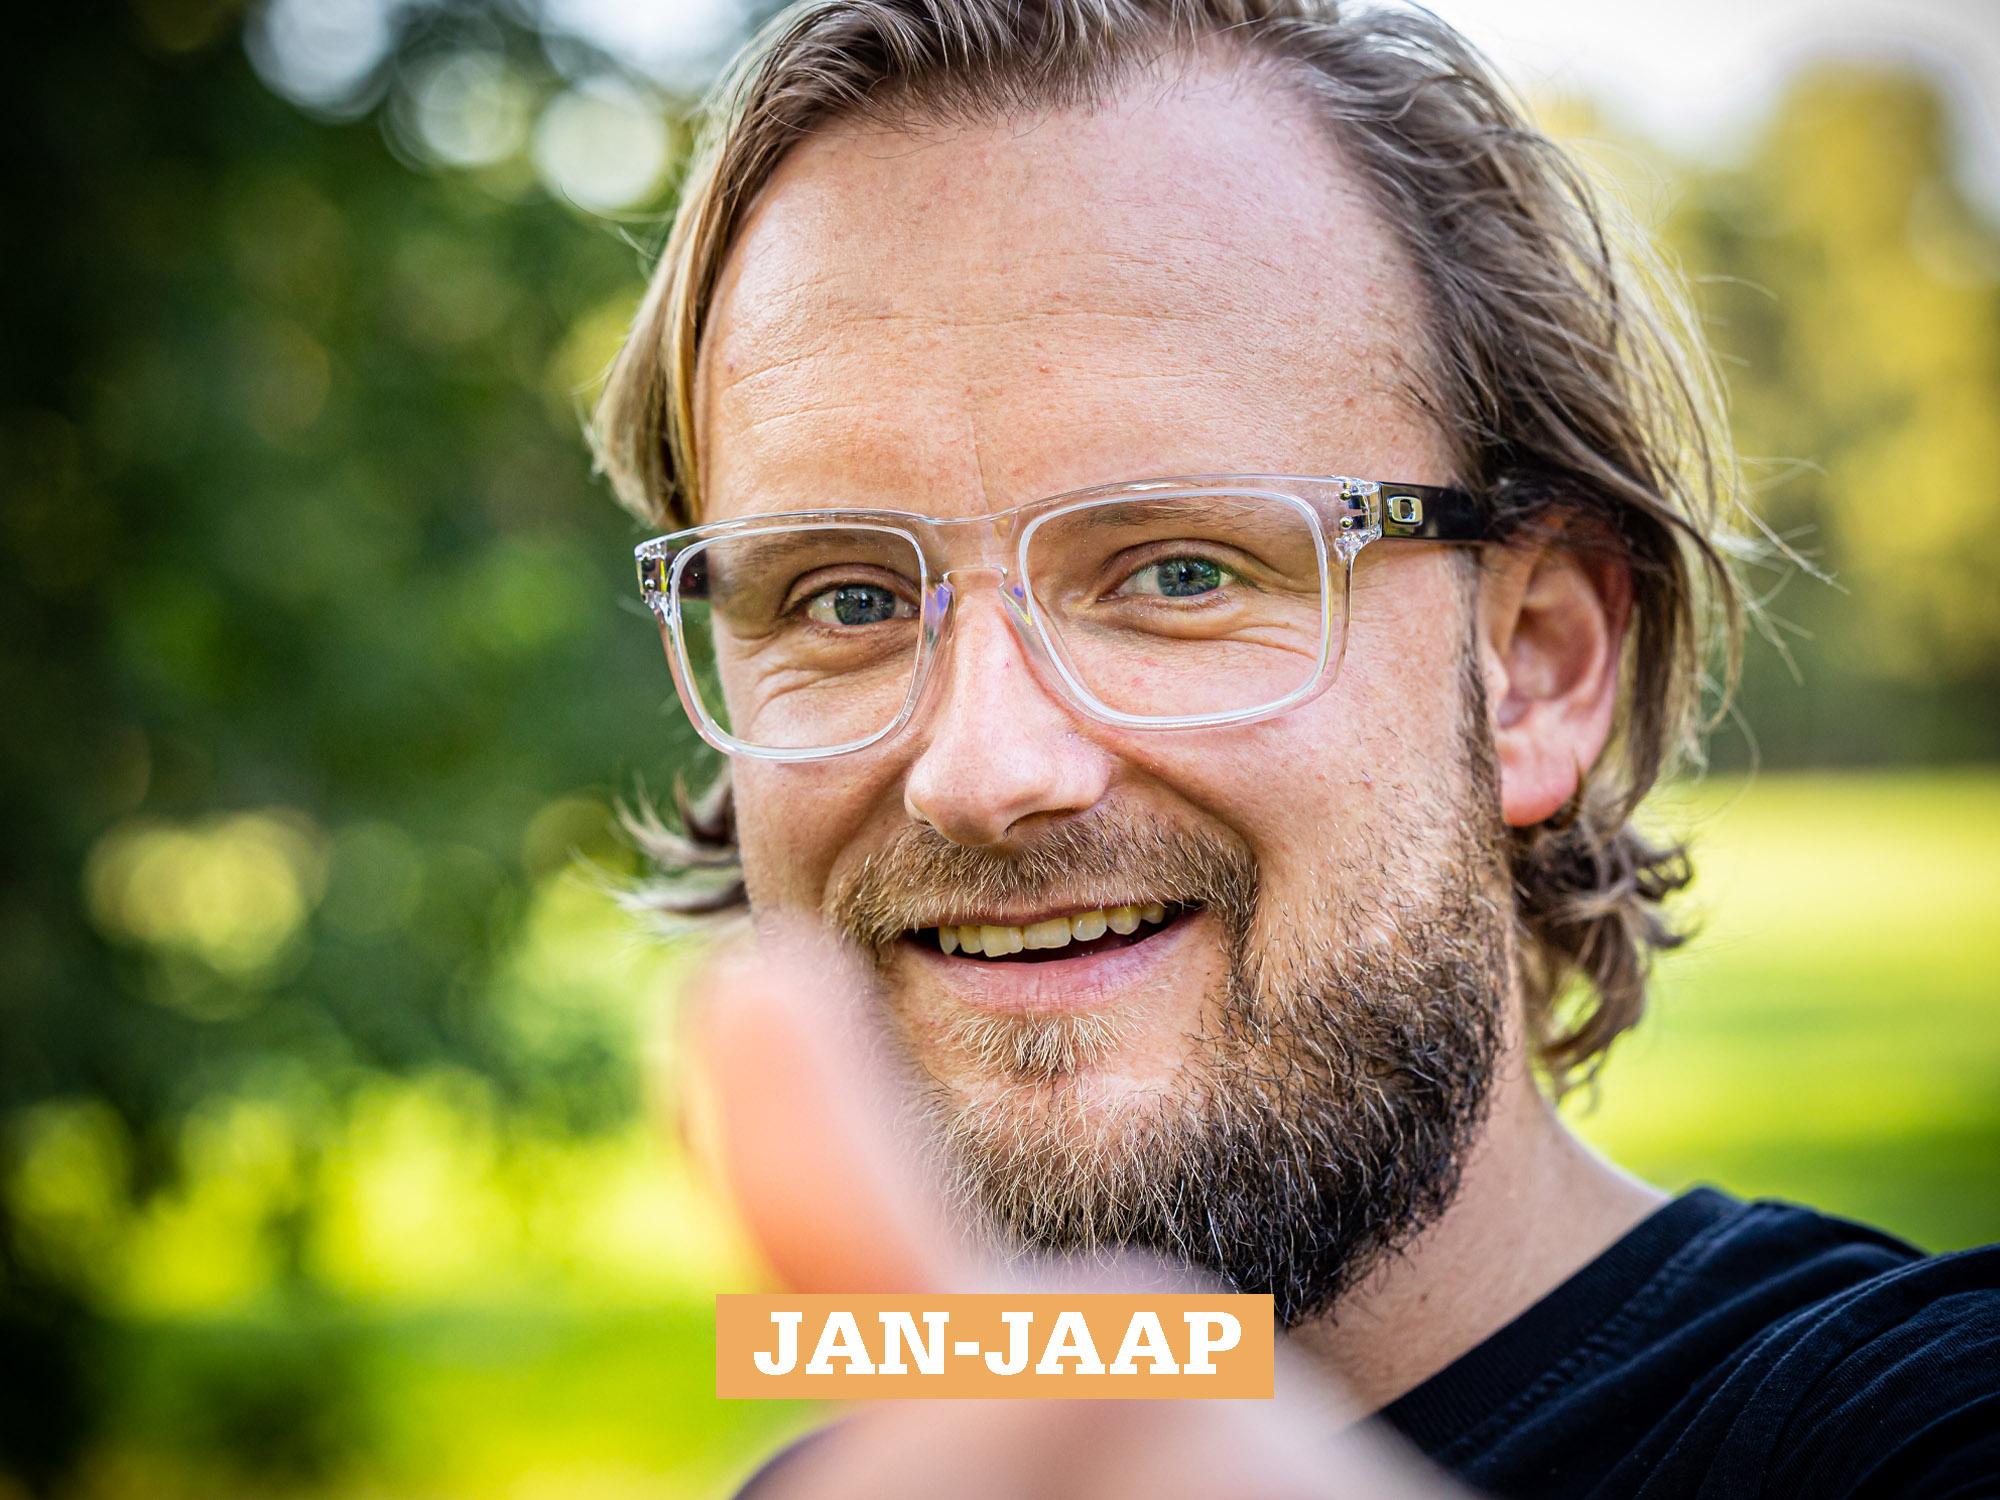 MvP_Jan-Jaap